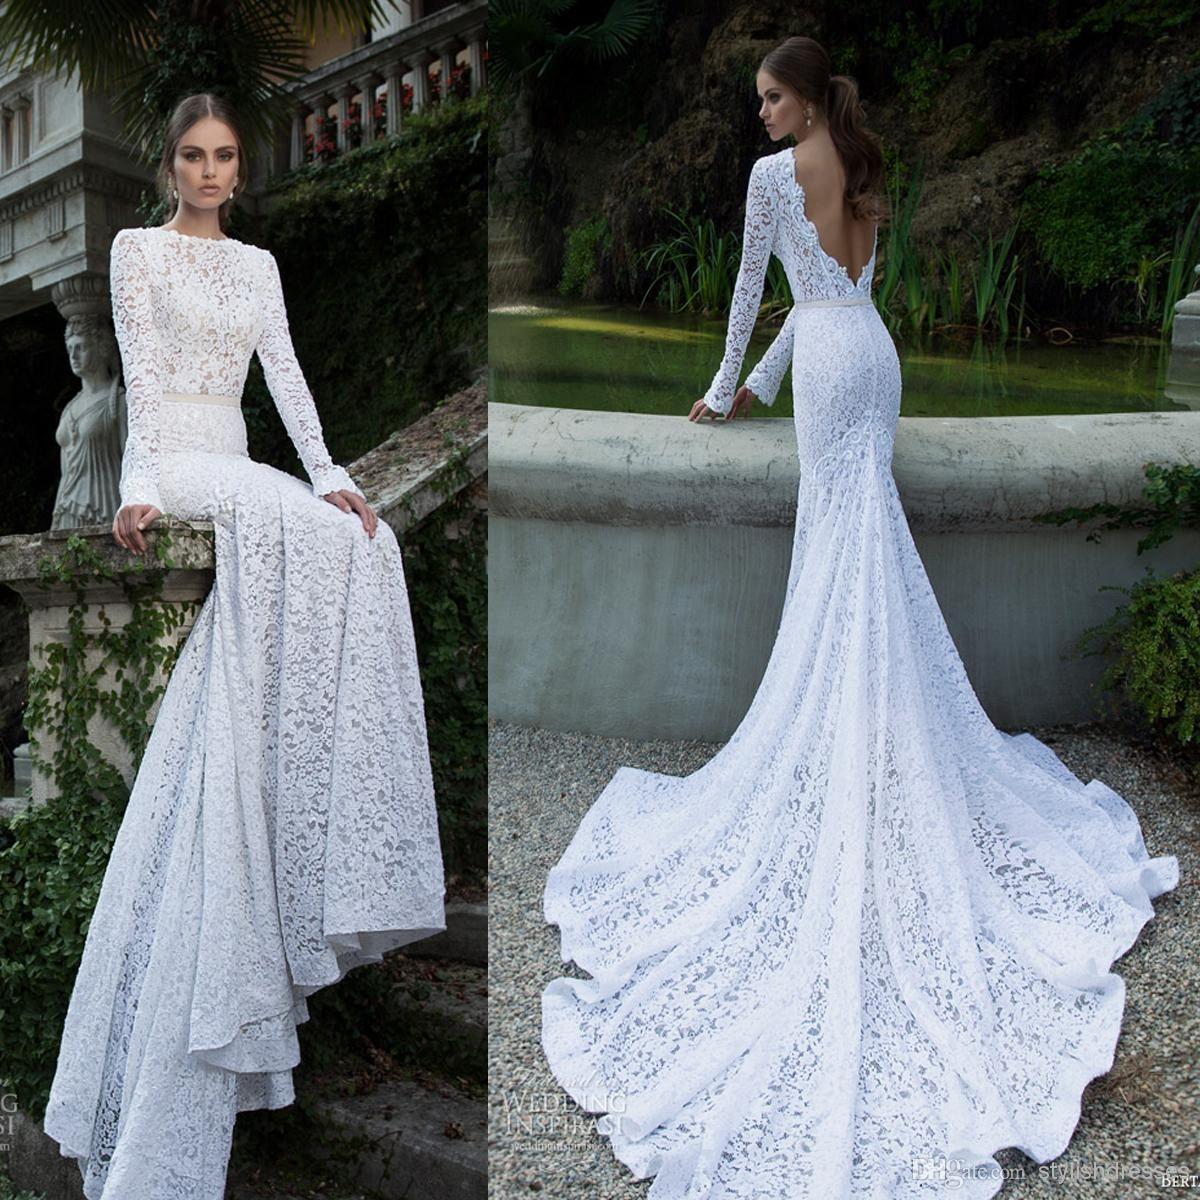 Wholesale Backless Wedding Dress - Buy 2014 Berta Lace Wedding ...